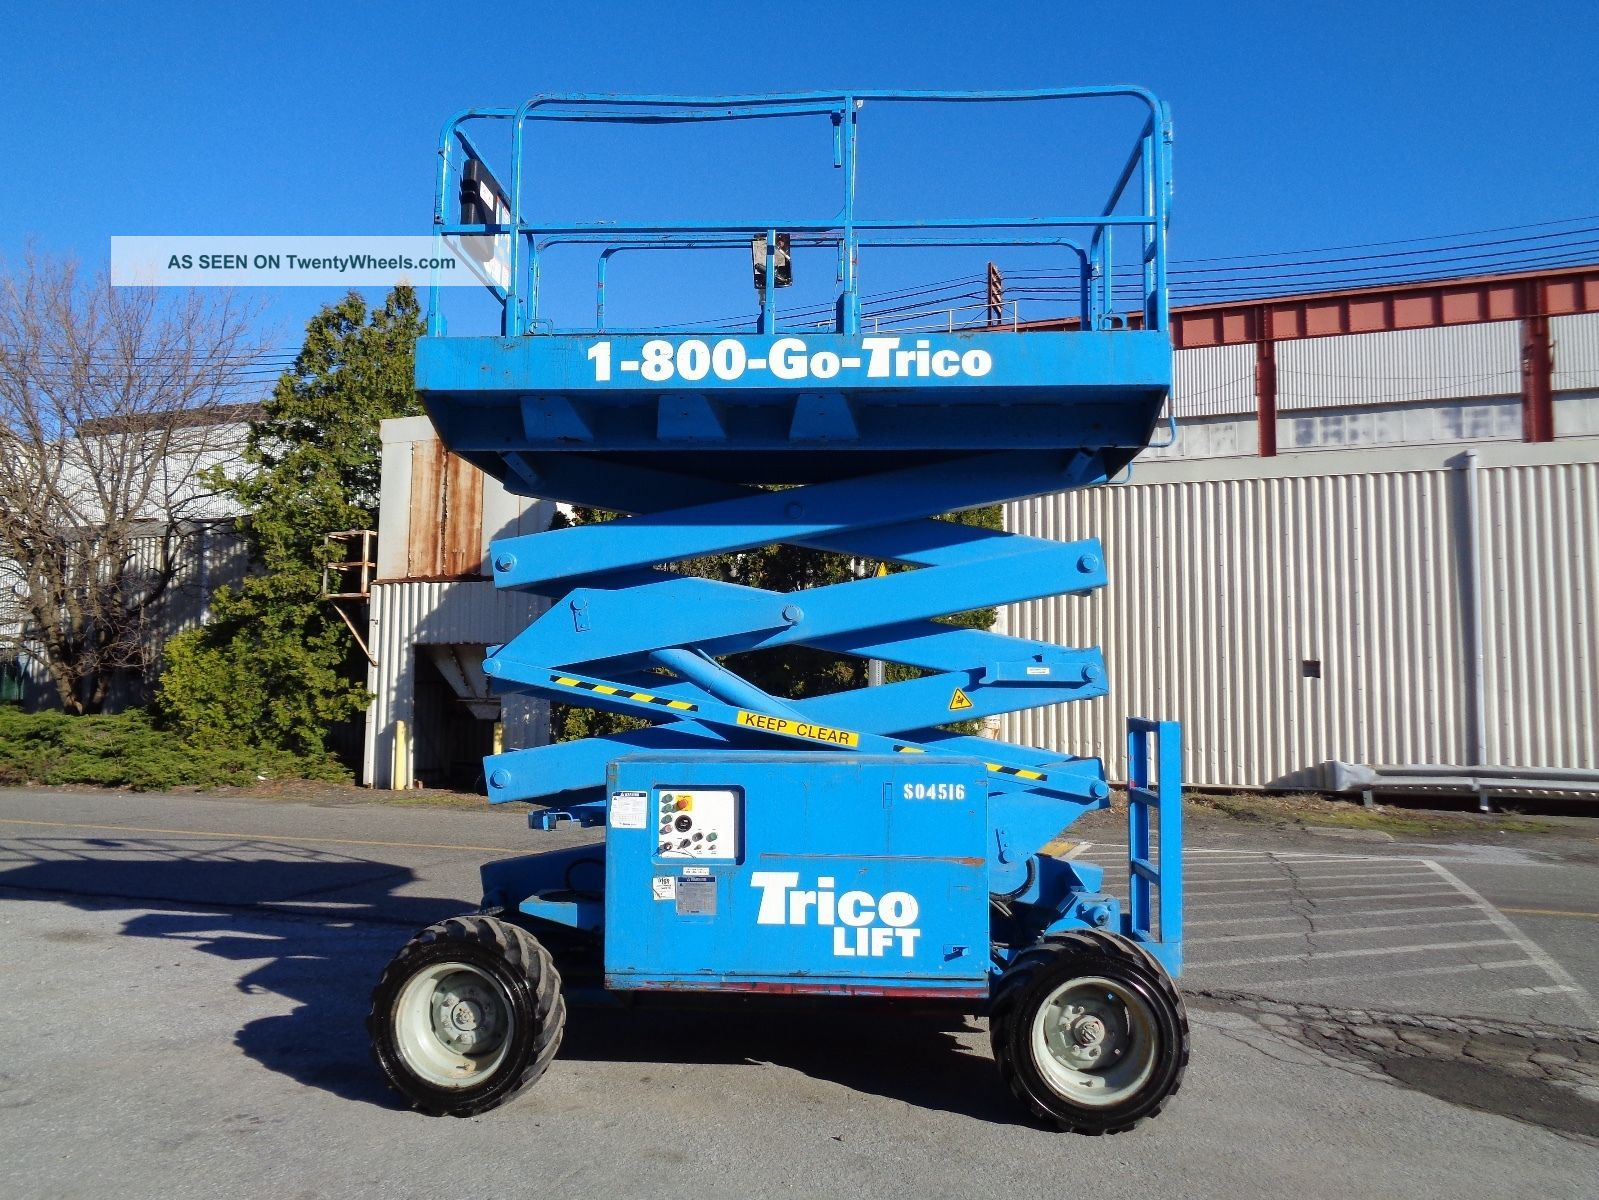 2009 Mec 3072rt 4x4 Rough Terrain 30ft Scissor Aerial Man Boom Lift Scissor & Boom Lifts photo